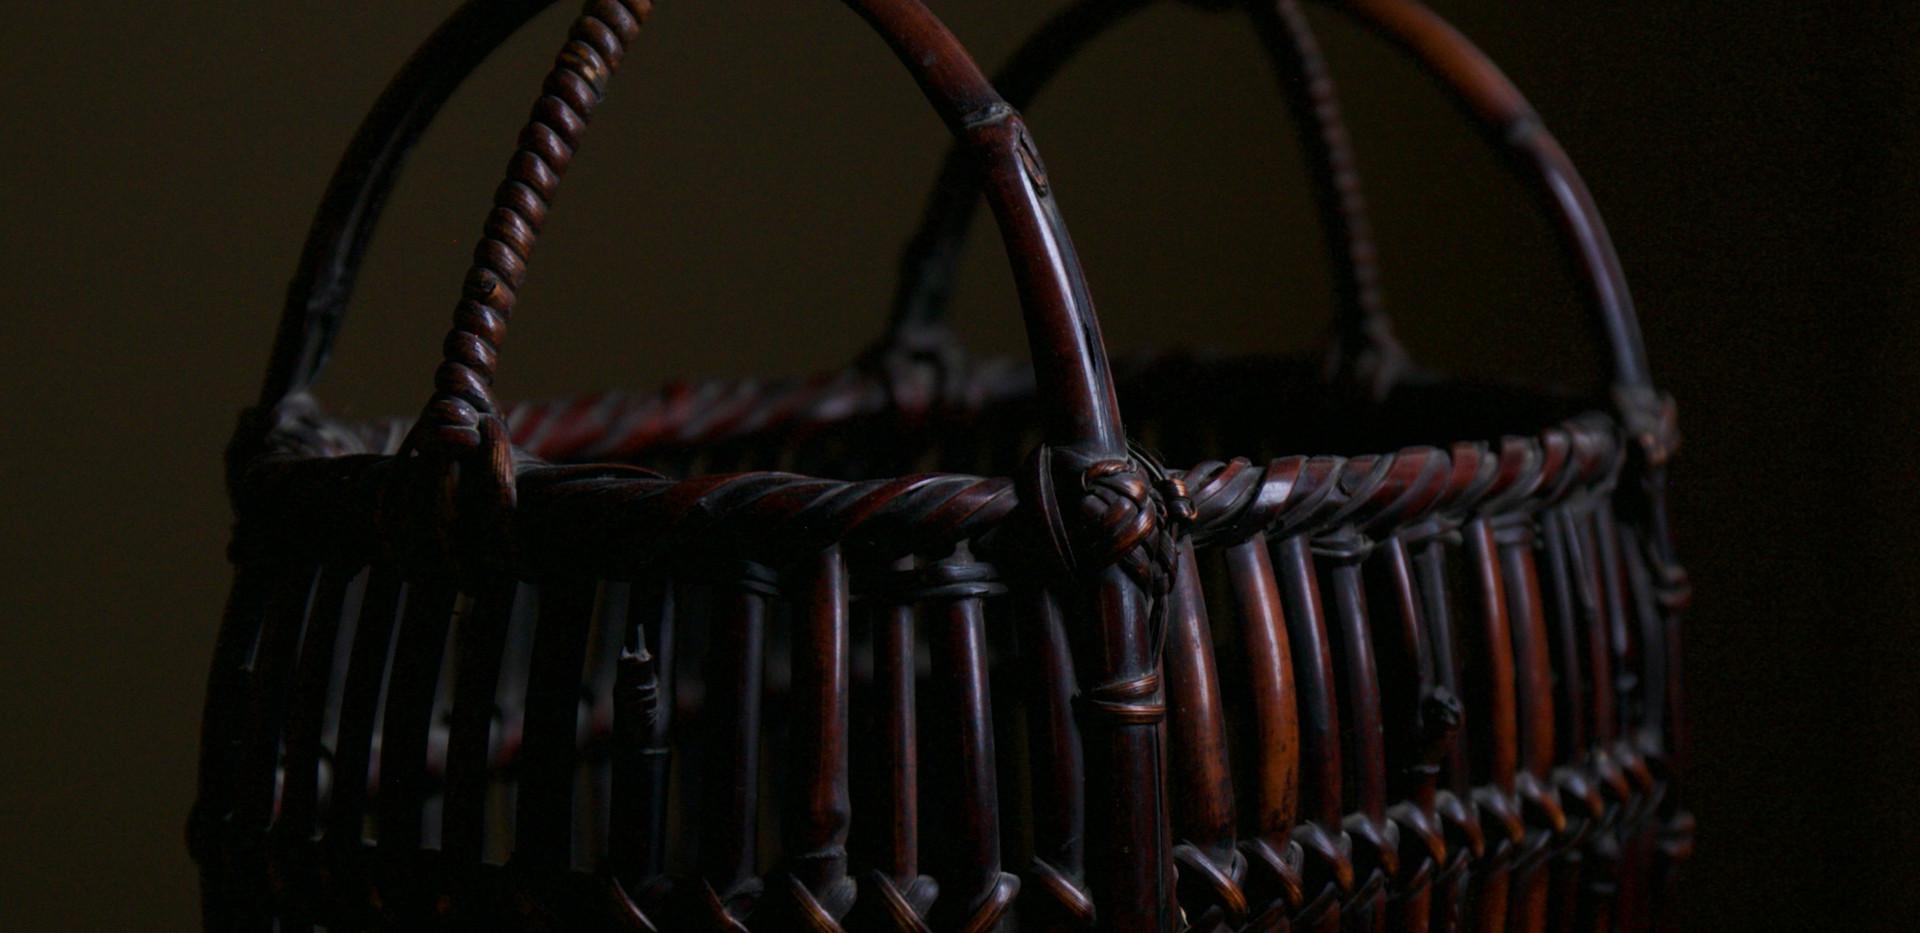 Tanabe Chikuunsai I Armor-shaped flower basket 02.jpg